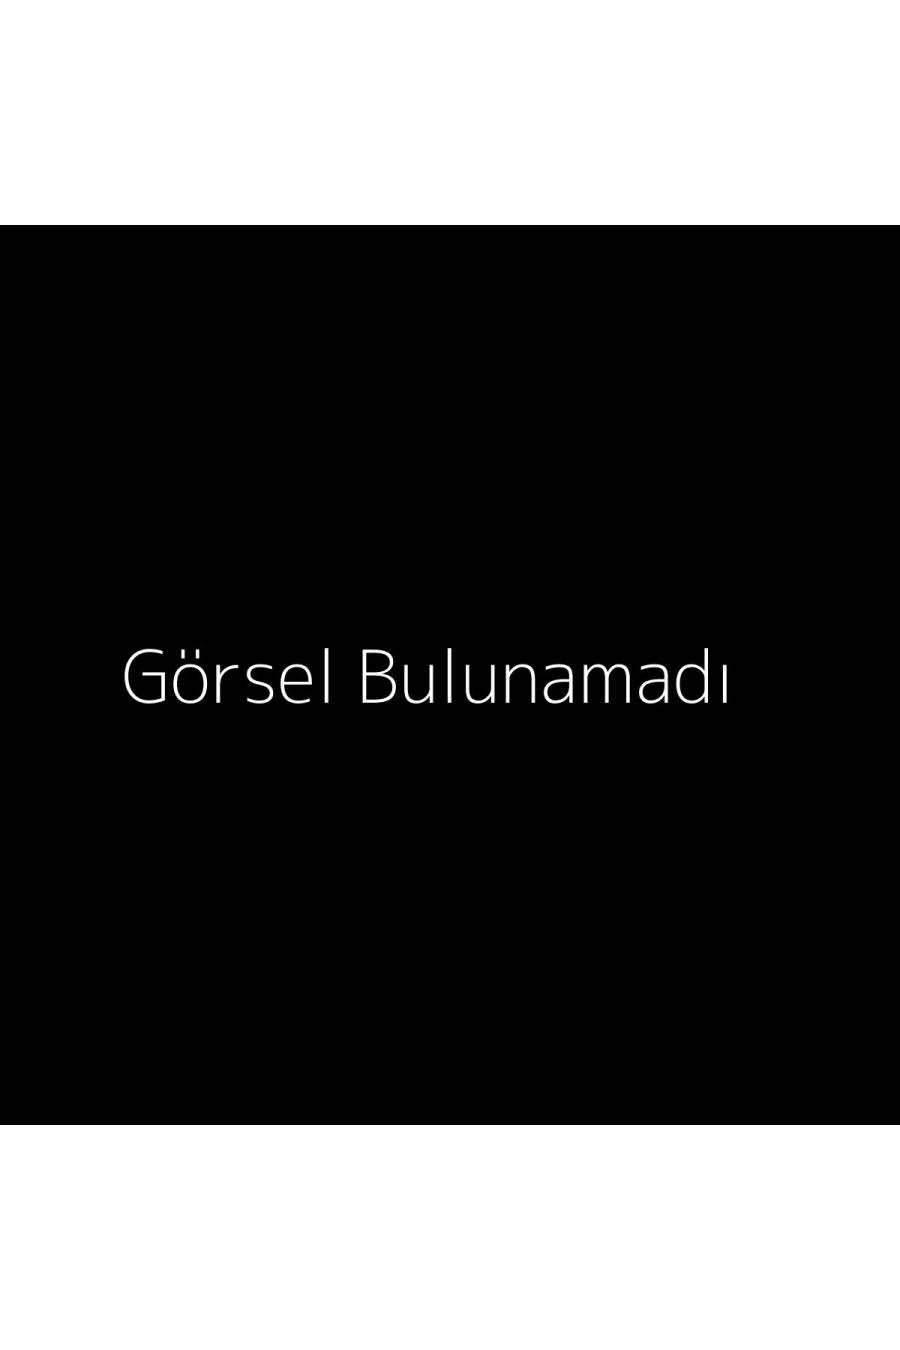 Endonezya Frinsa - Sigarar Utang Kahve Çekirdeği - 250gr.